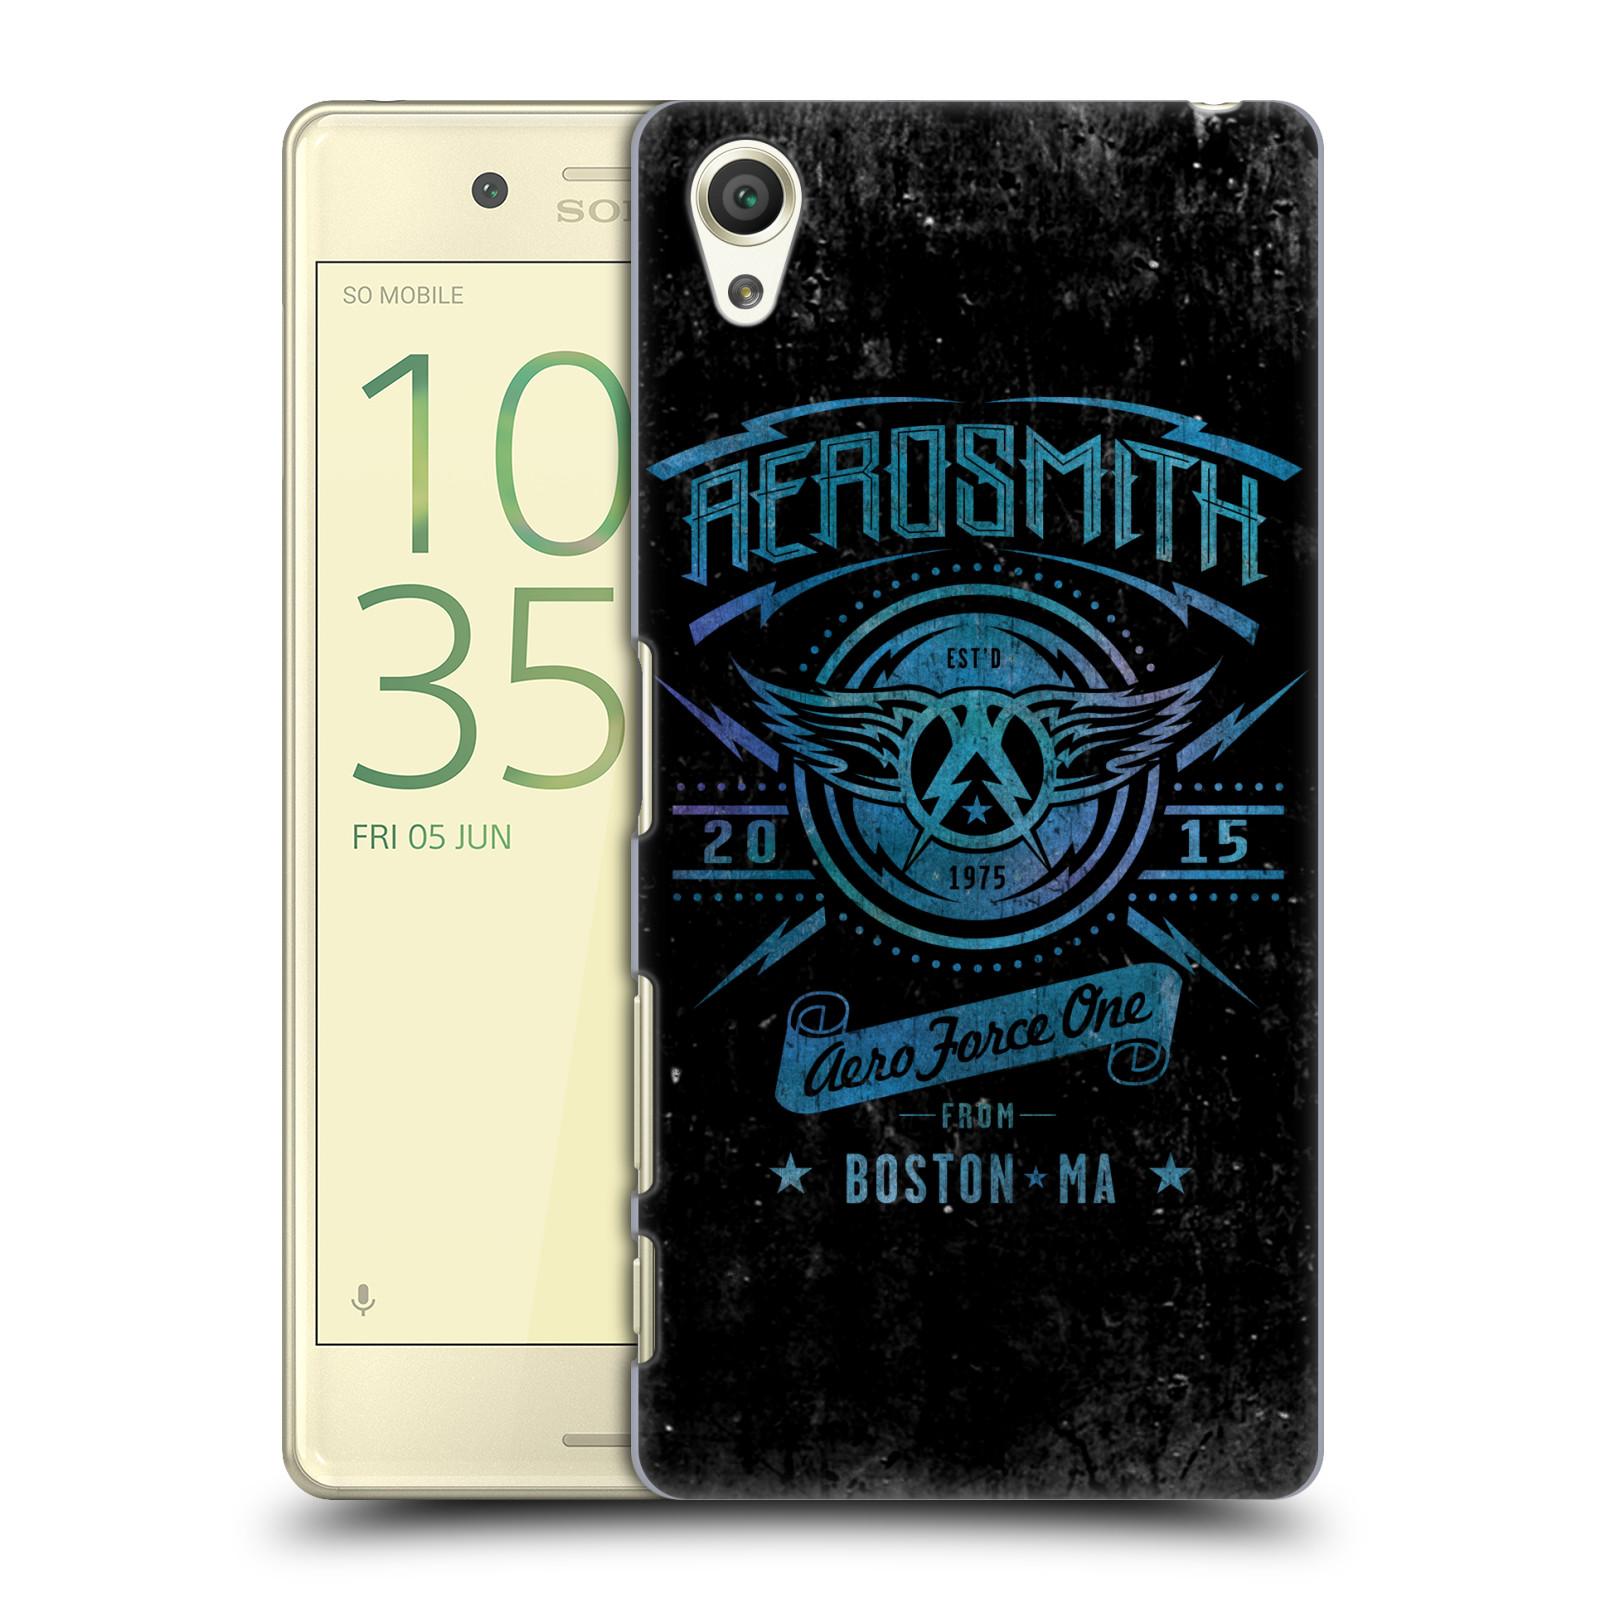 Plastové pouzdro na mobil Sony Xperia X HEAD CASE - Aerosmith - Aero Force One